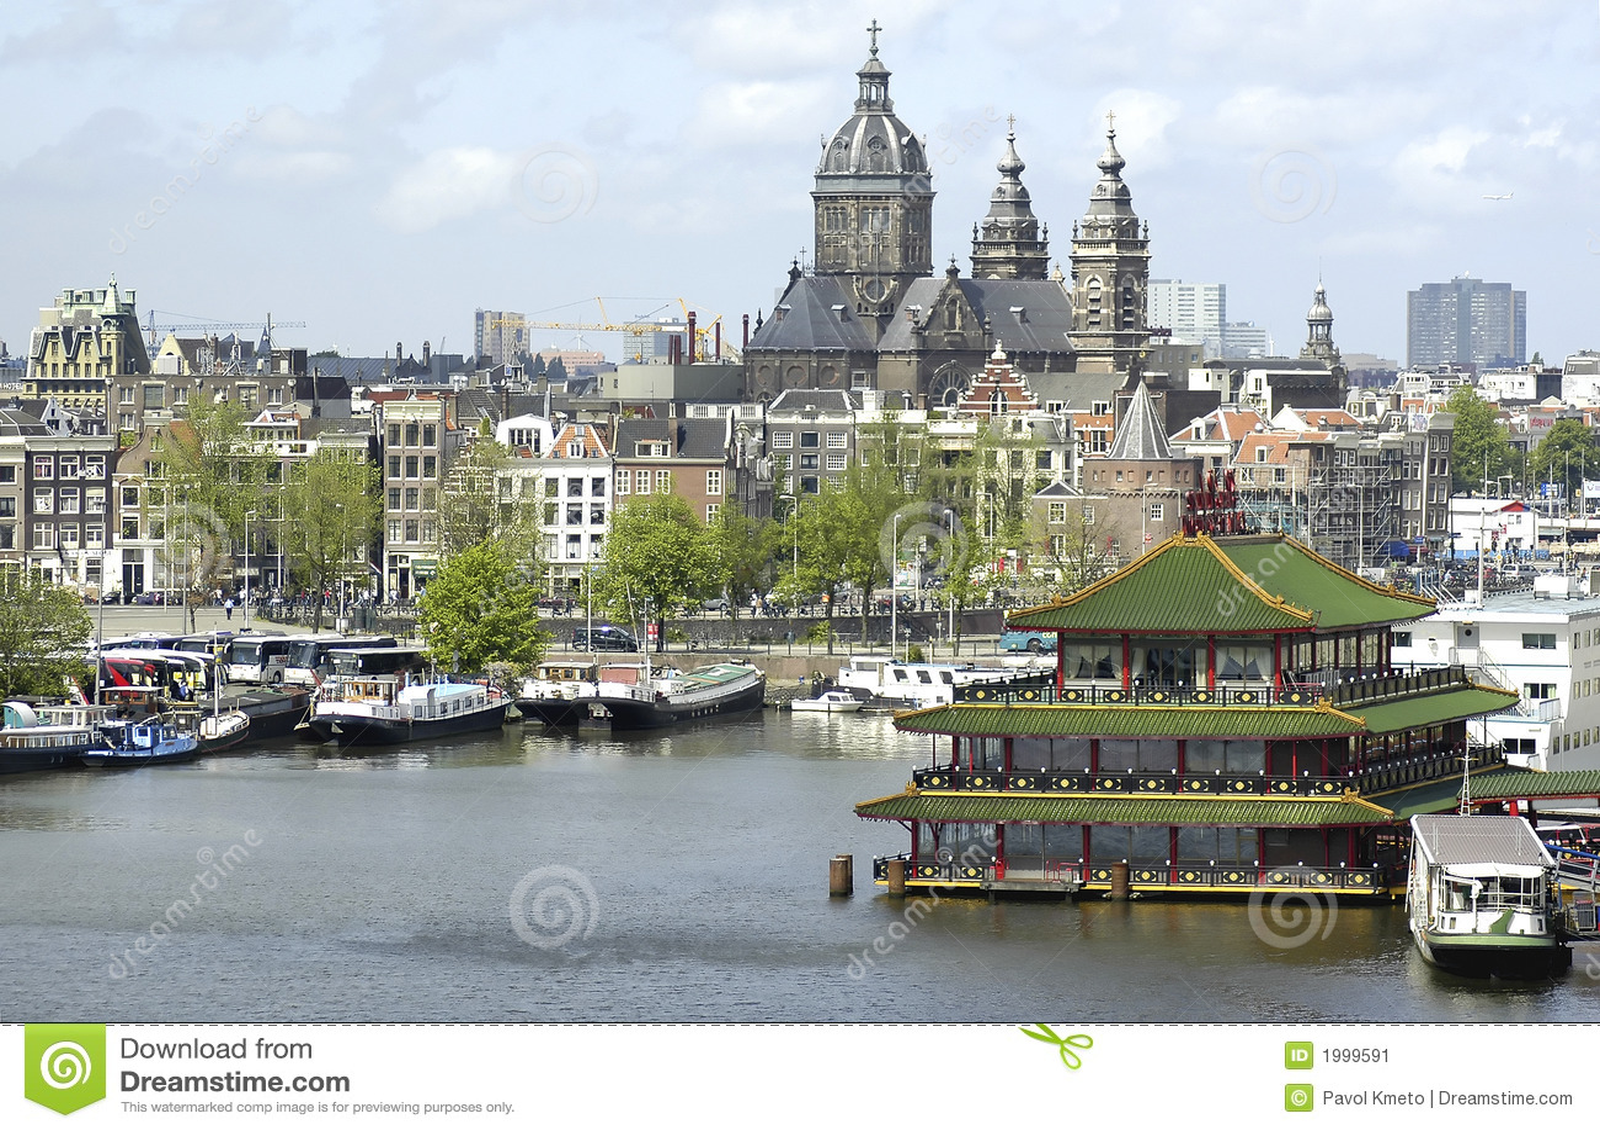 Sint nicolaaskerk amsterdam immagine stock immagine di for Houseboat amsterdam prezzi